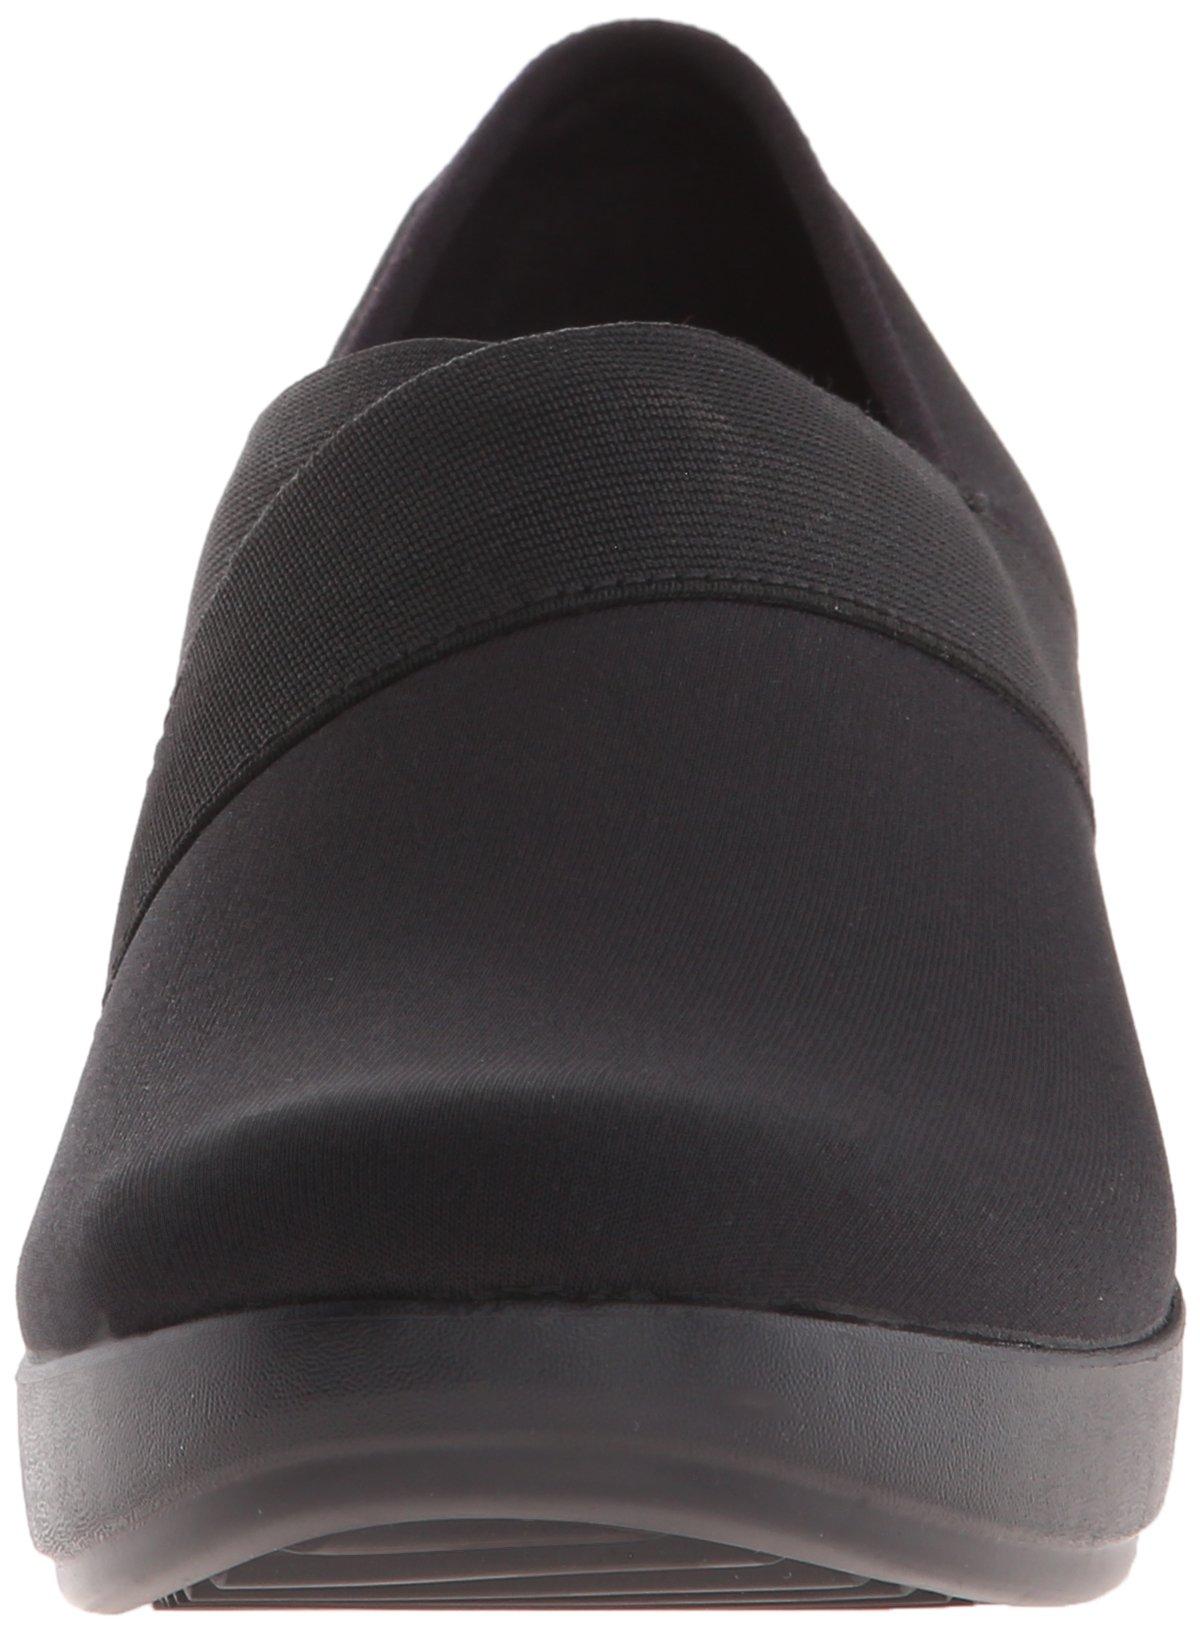 Crocs Women's Busy Day Stretch Asymmetrical Wedge Flat, Black/Black, 10 M US by Crocs (Image #4)